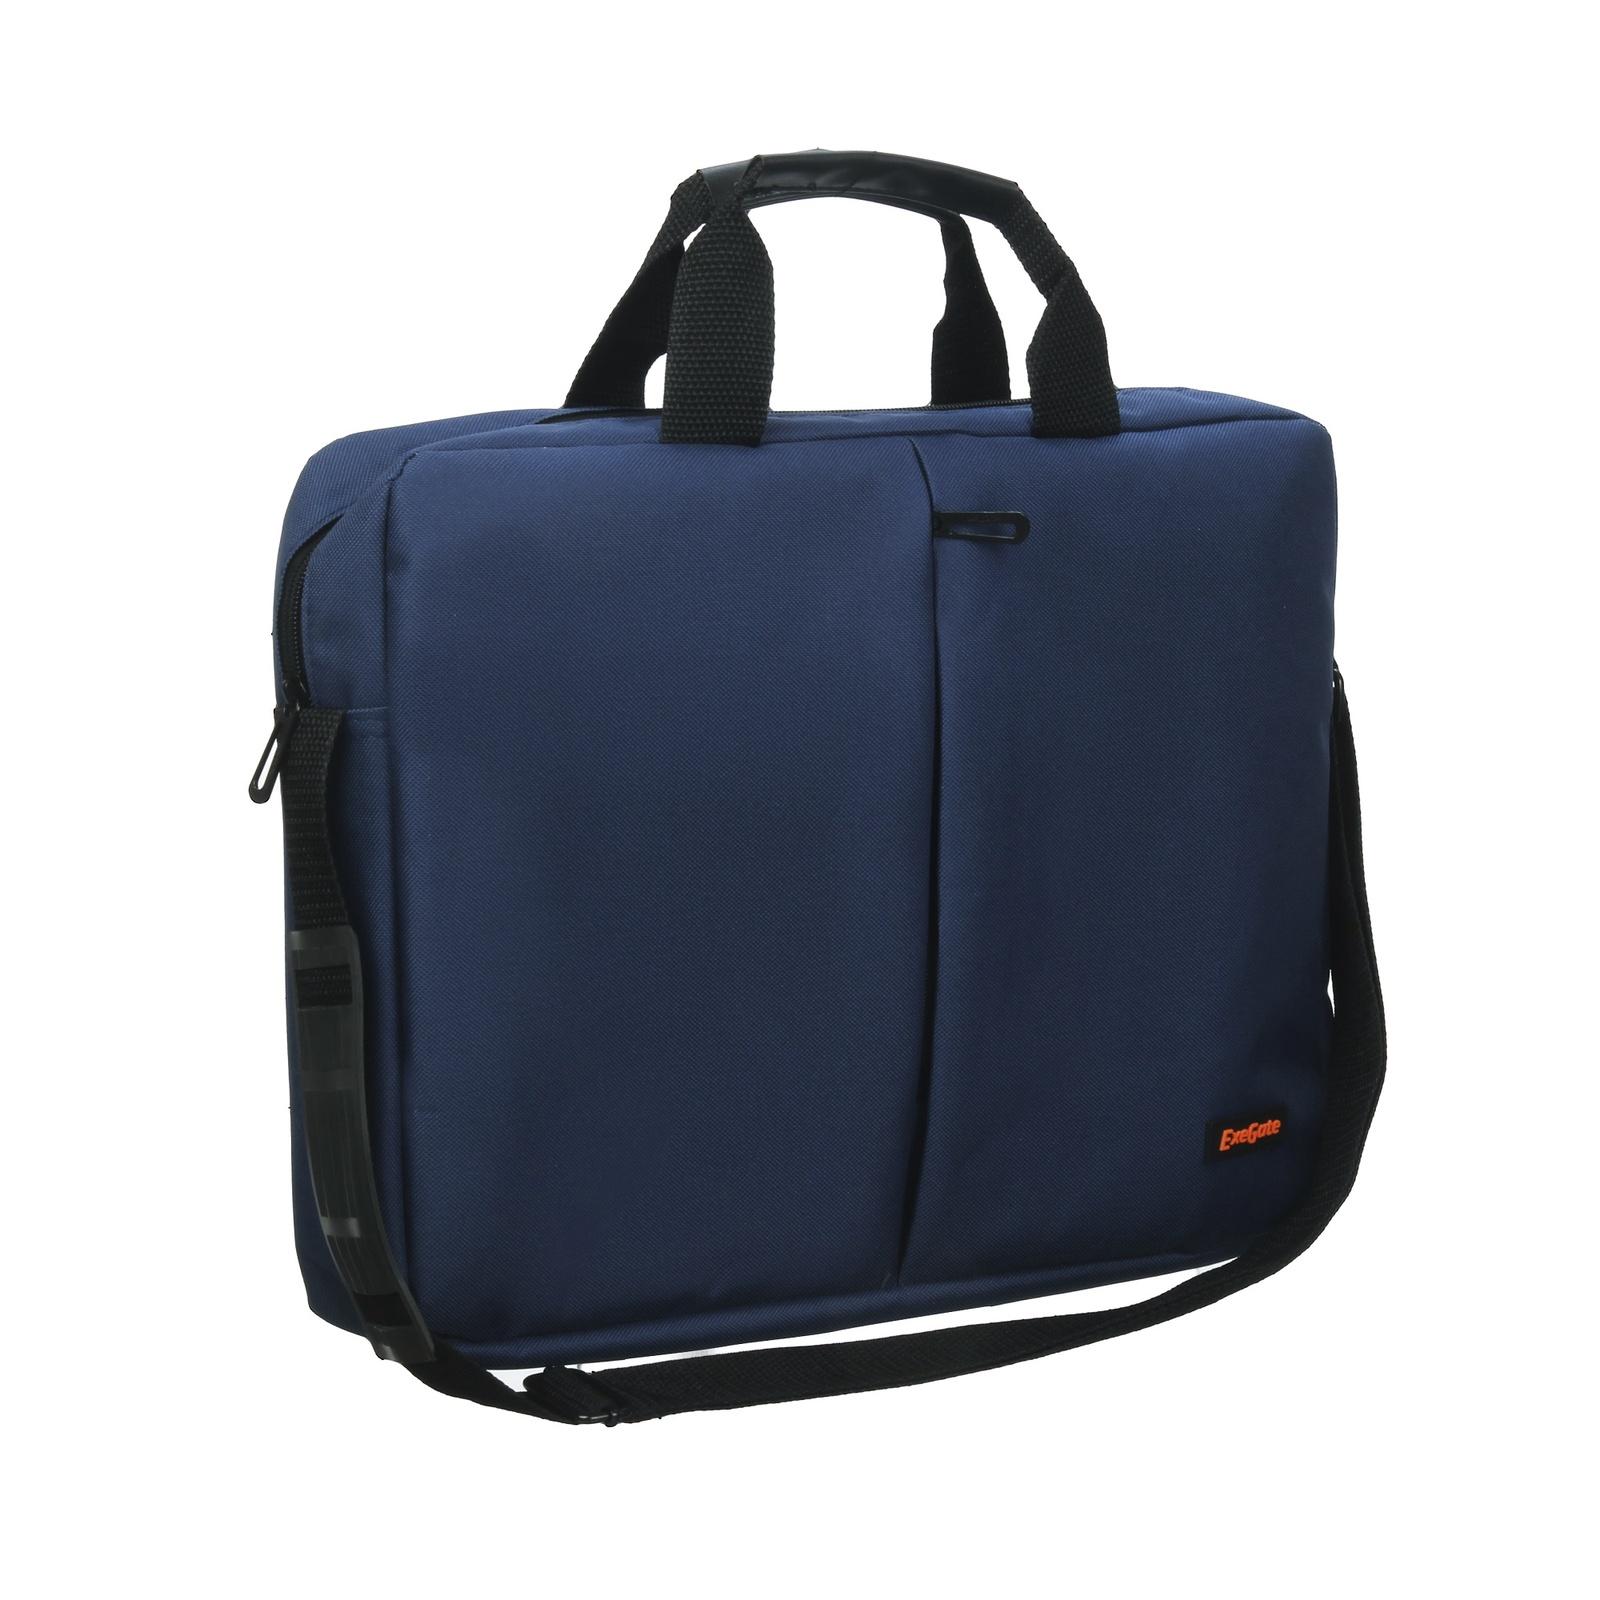 Сумка Exegate Office F1590 Dark-Blue, темно-синяя, полиэстер, для ноутбуков до 15.6 аксессуар сумка 15 6 exegate office f1595 black